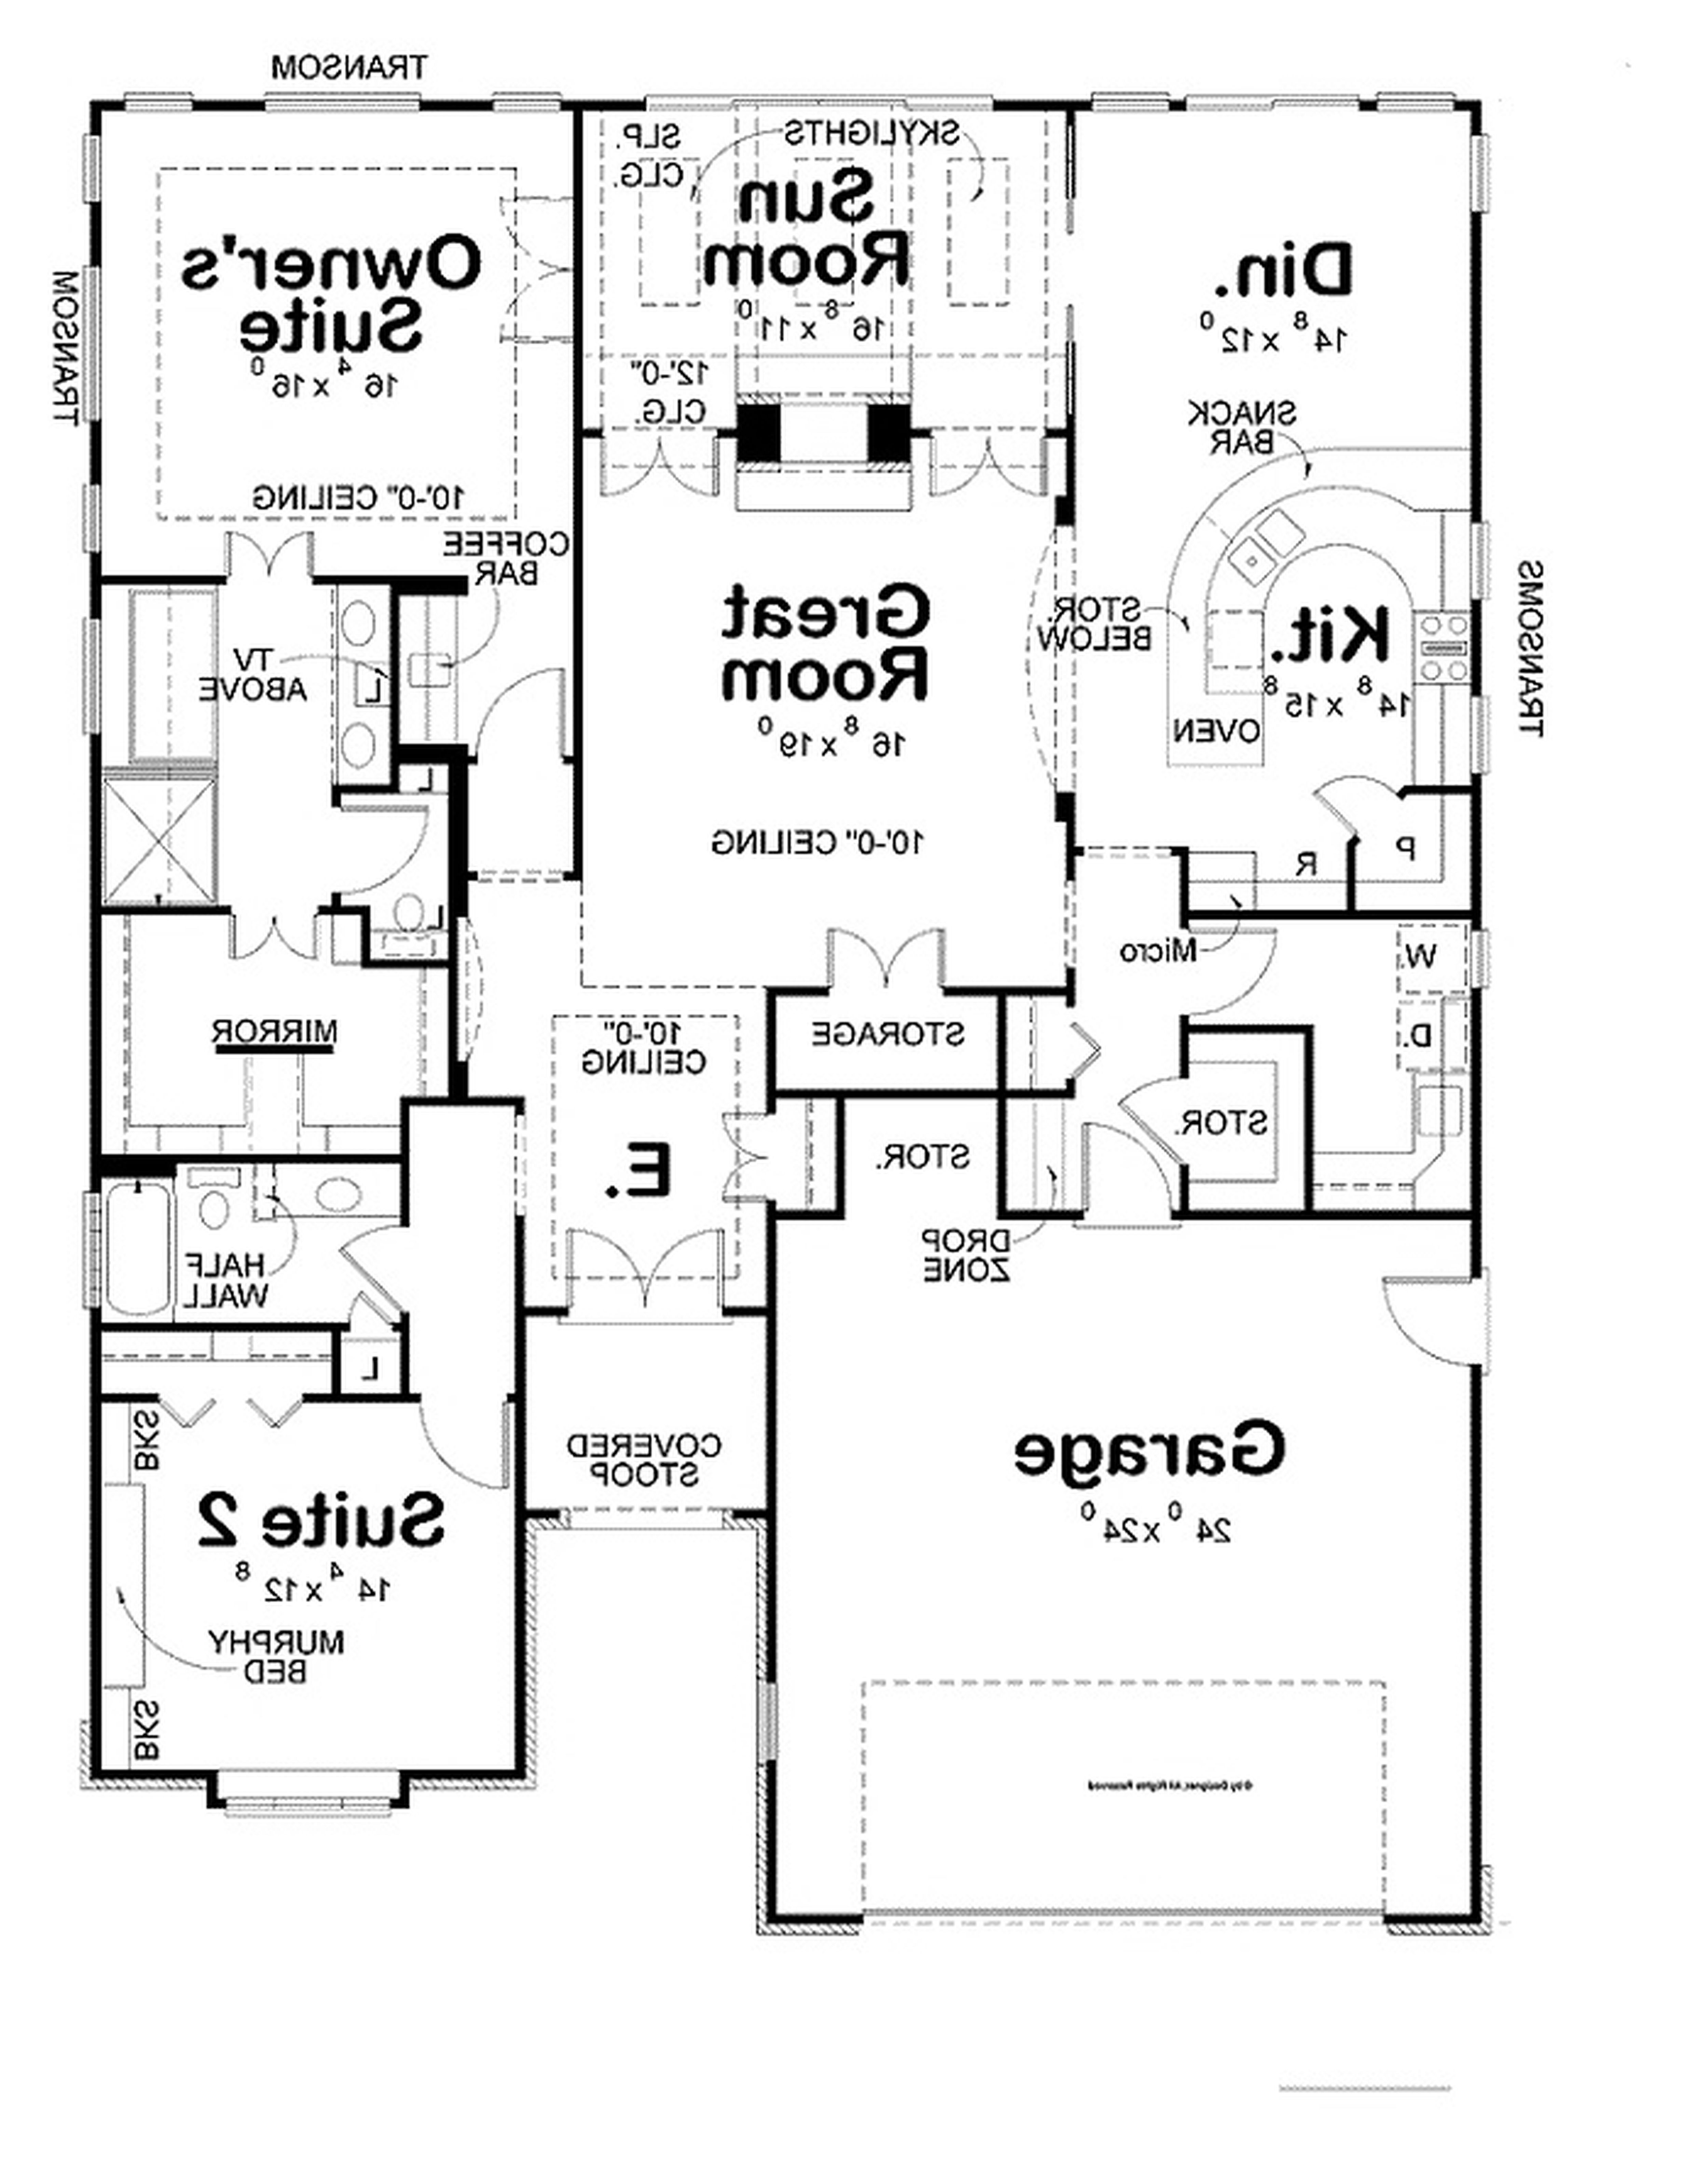 5b85ed59d1d0daf2b8abe5fe15d66543 rectangular house floor plans design bedroom ranch house plans,Long Ranch Home Plans